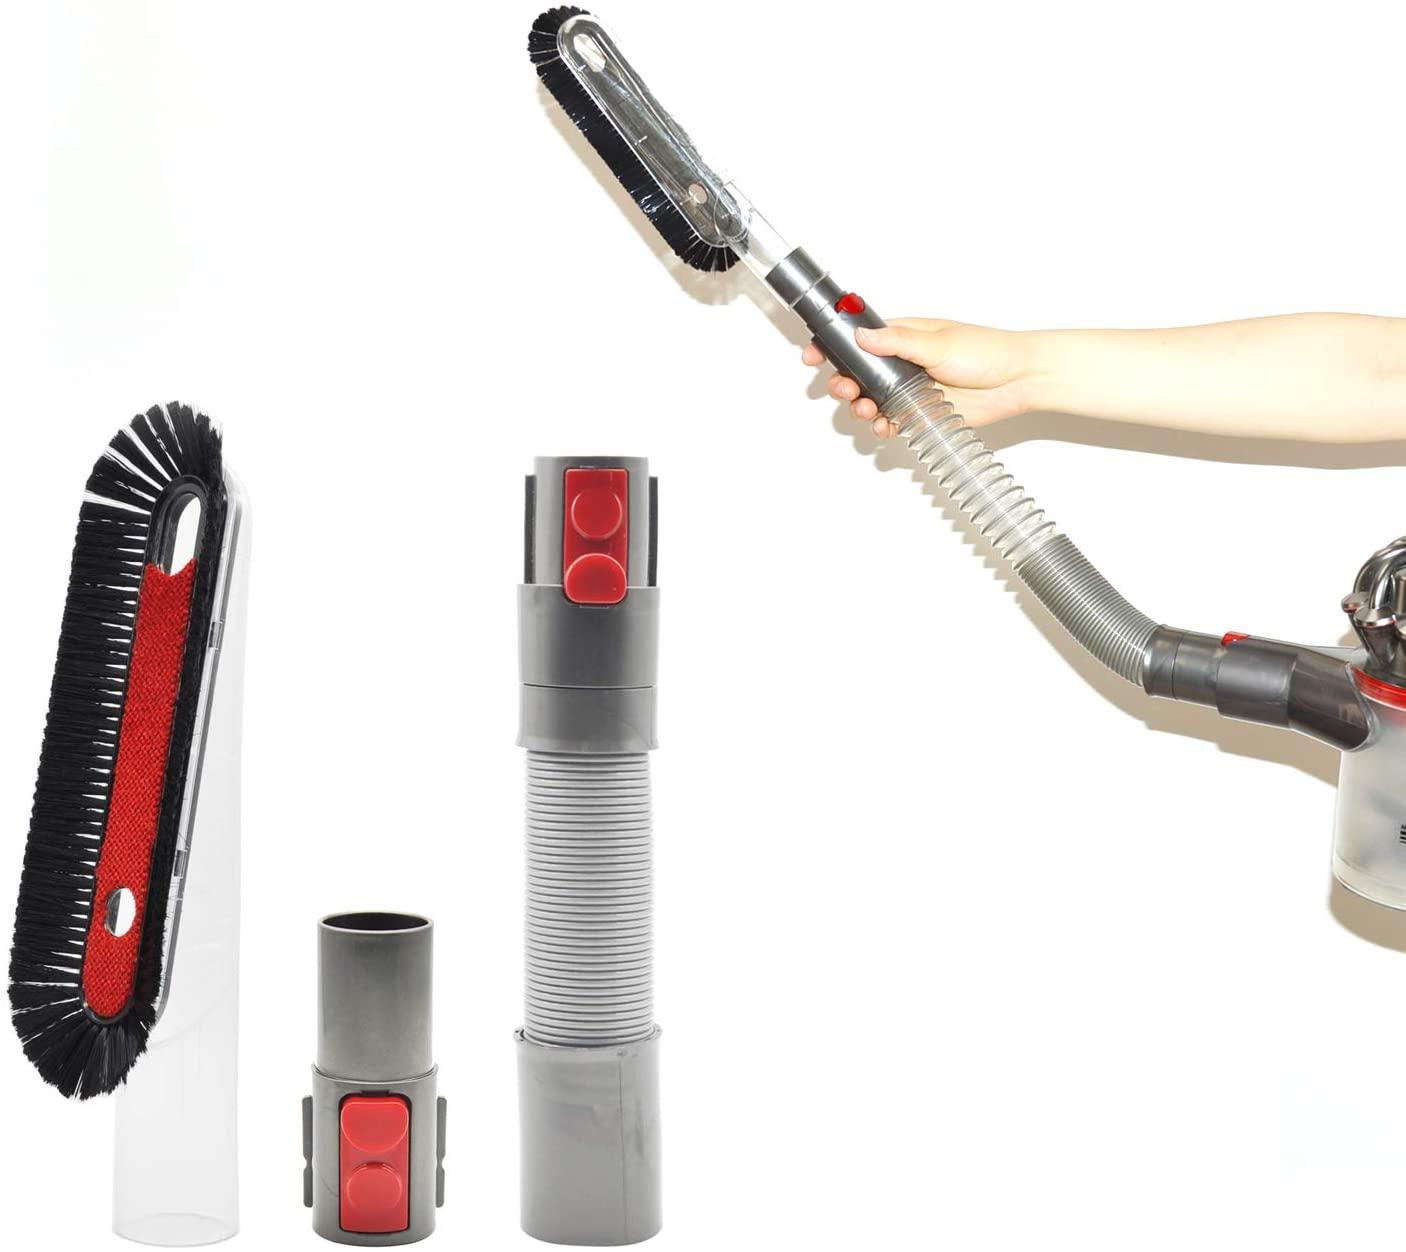 EZ SPARES Replacement Brush Kits for V7 V8 V10 V11,Soft Dusting Brush Crevice Tool,Extension Hose,Anti-Static Attachment